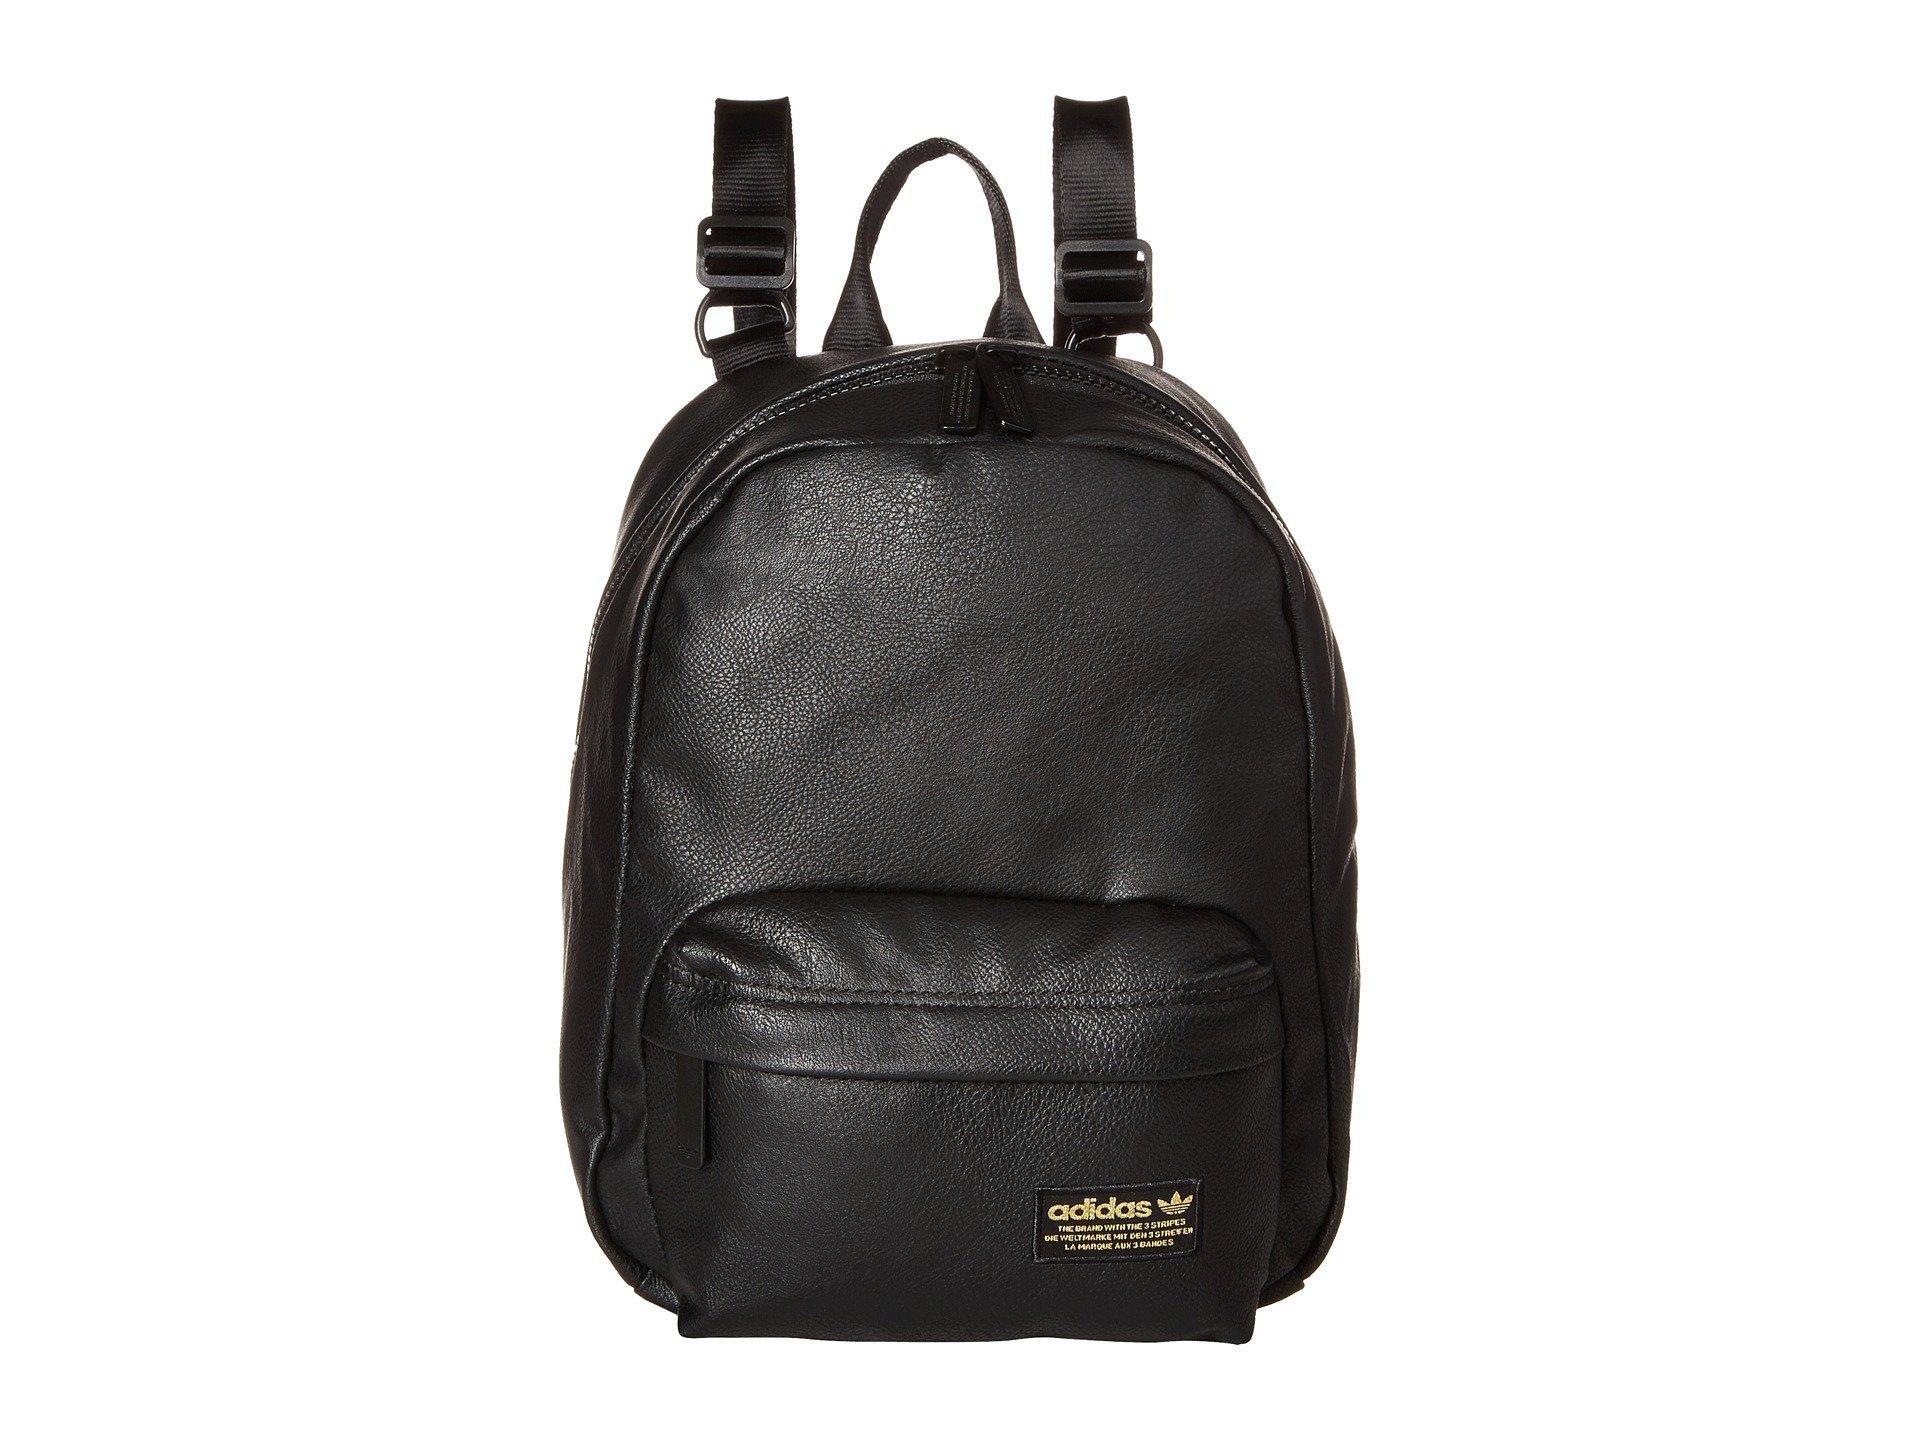 3cfd7b5d48a3 Lyst - adidas Originals National Compact Premium Backpack (black Pu ...